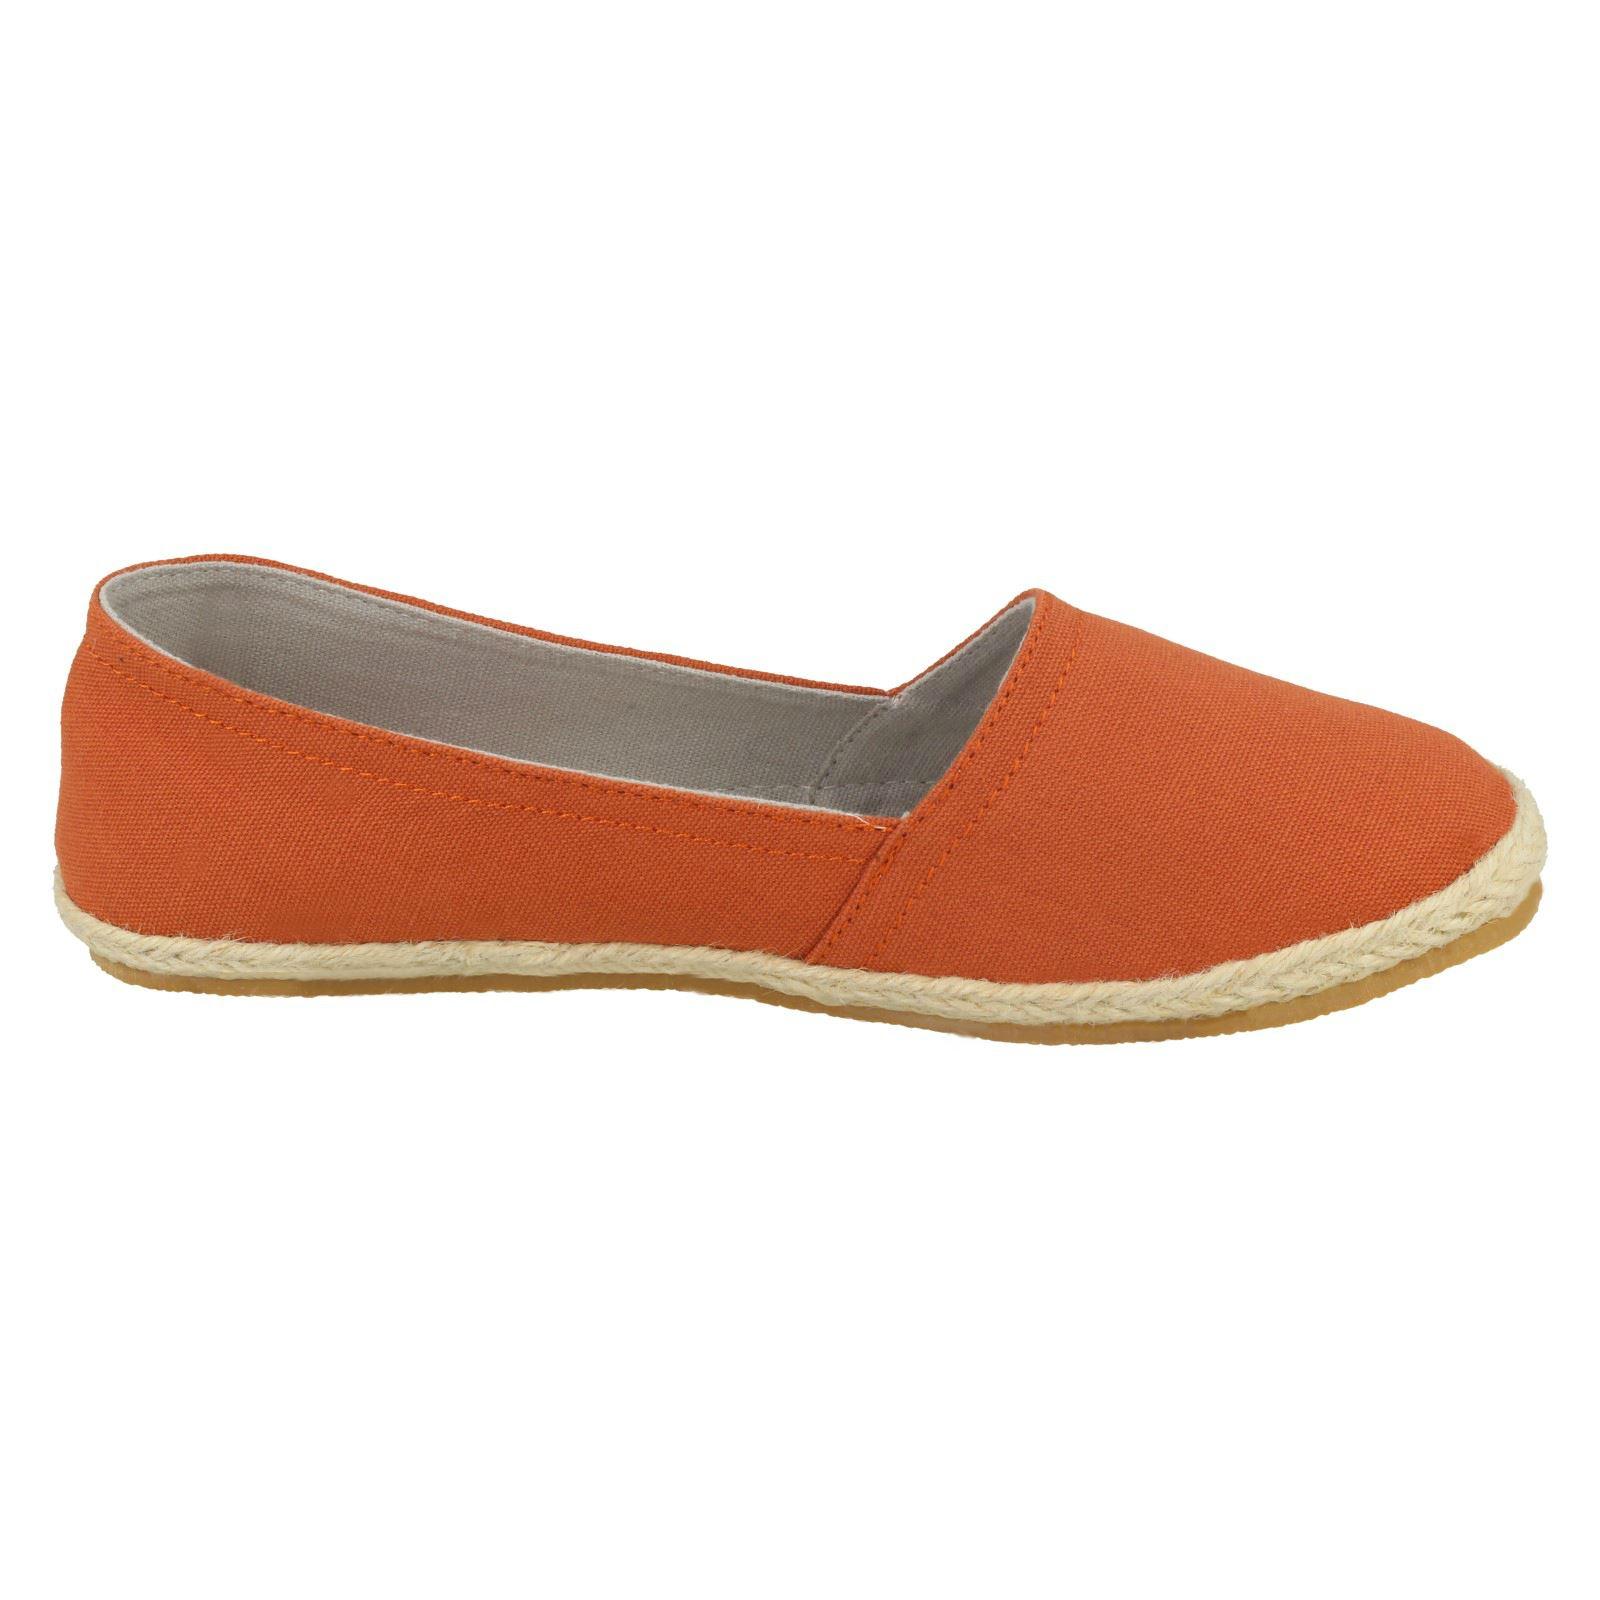 orange On Dusty Ladies Flat Slip Orange Spot espadrille Zx8qp07